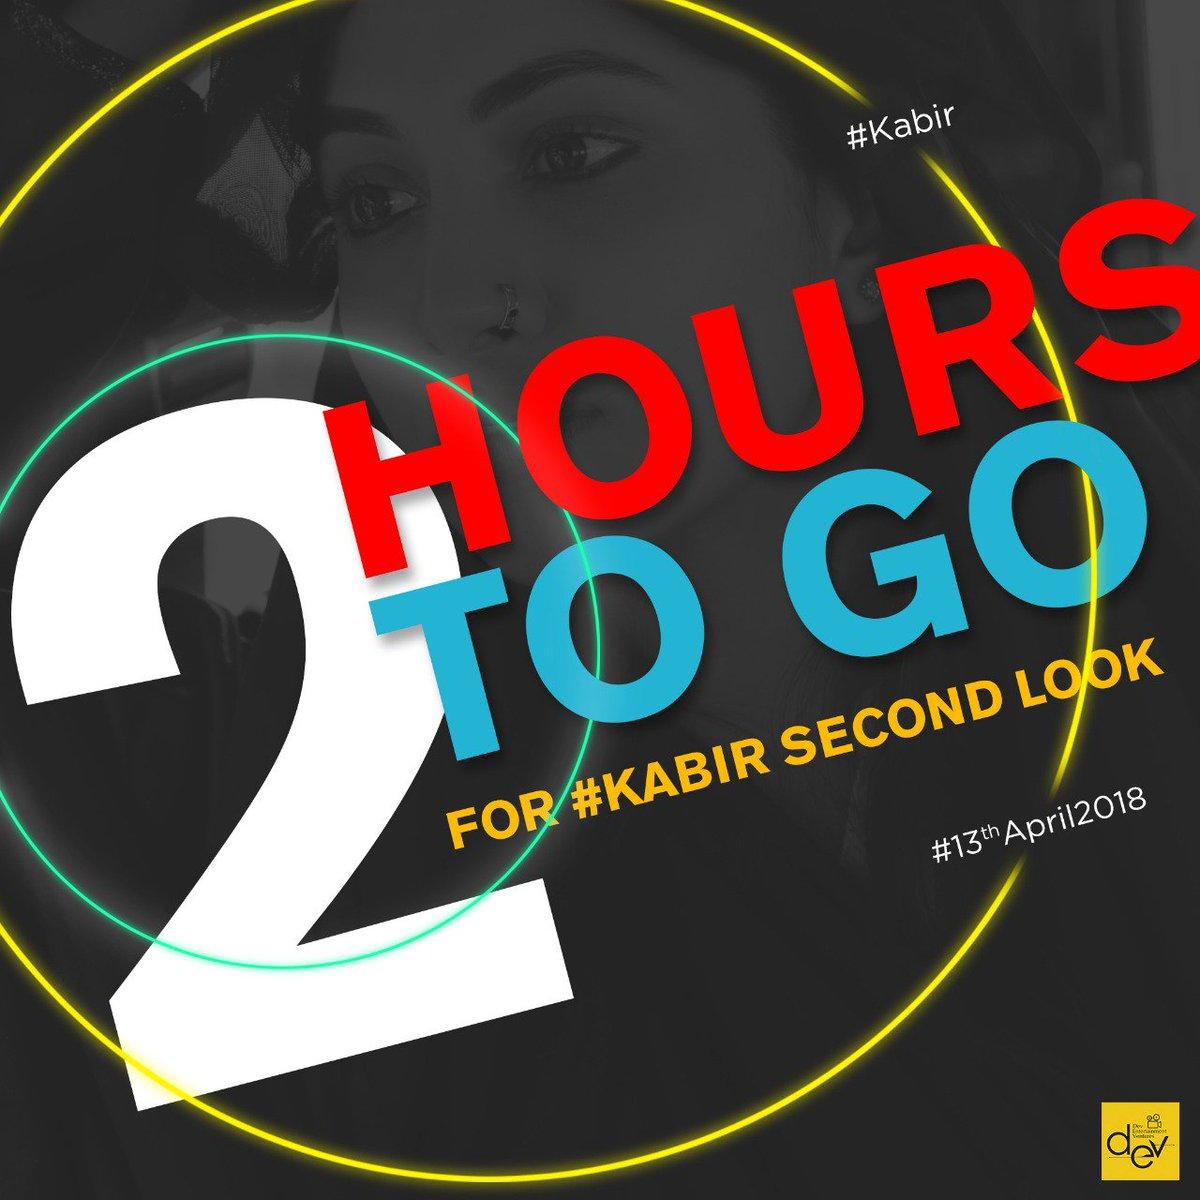 Just 2 hours to go. Keep eyes on our Social Media Pages for the Exclusive #KABIR 2nd Look.  @idevadhikari, @RukminiMaitra, @aniket9163, @iindraadip, @DEV_PvtLtd.  #PeaceHasAPrice #April2018.